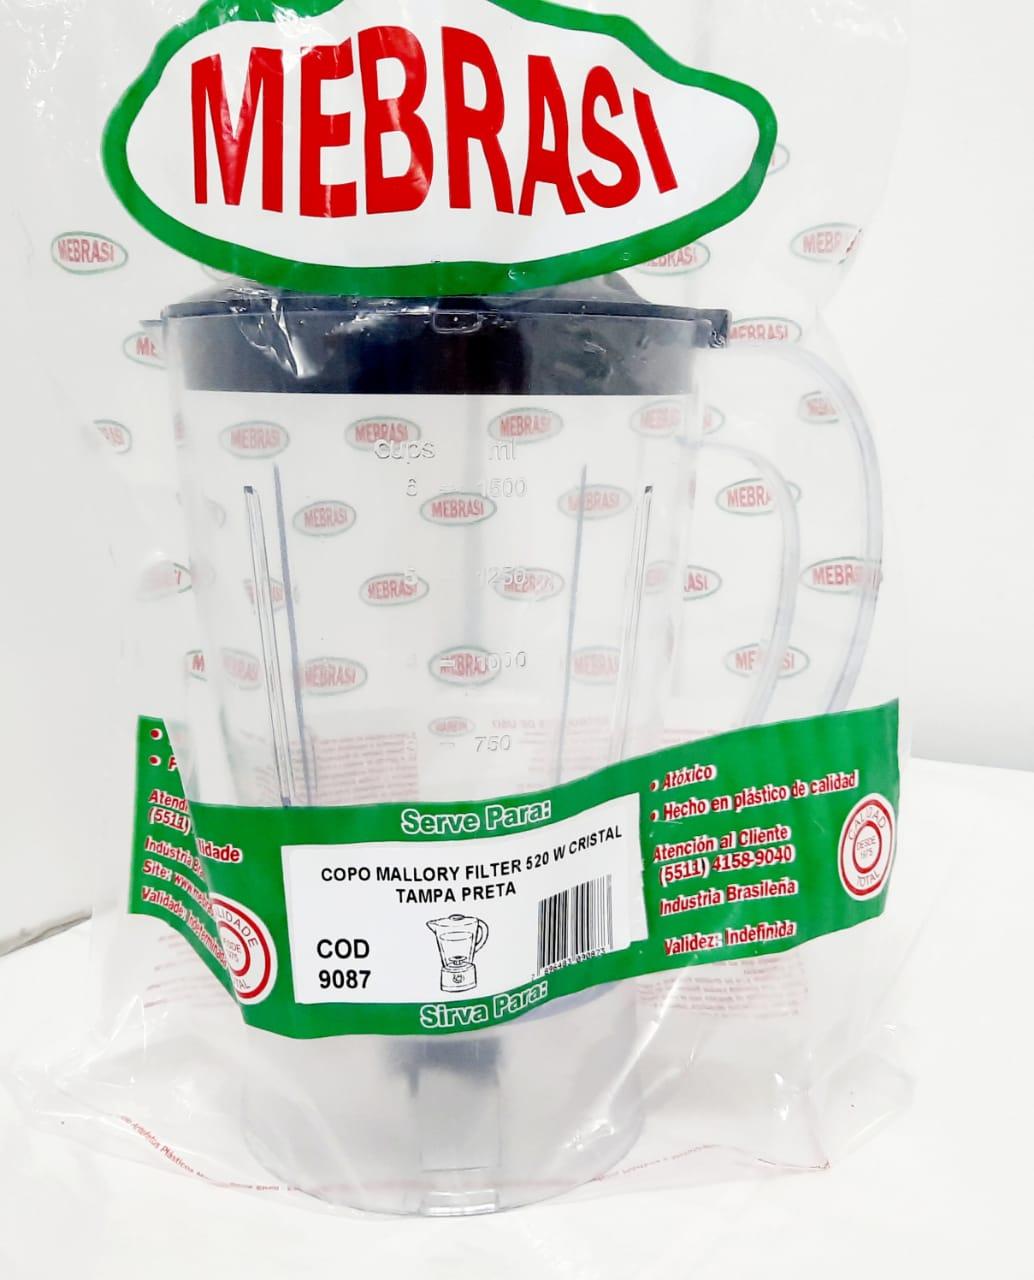 Copo MALL CRS FILTER 520W T/P - Mebrasi